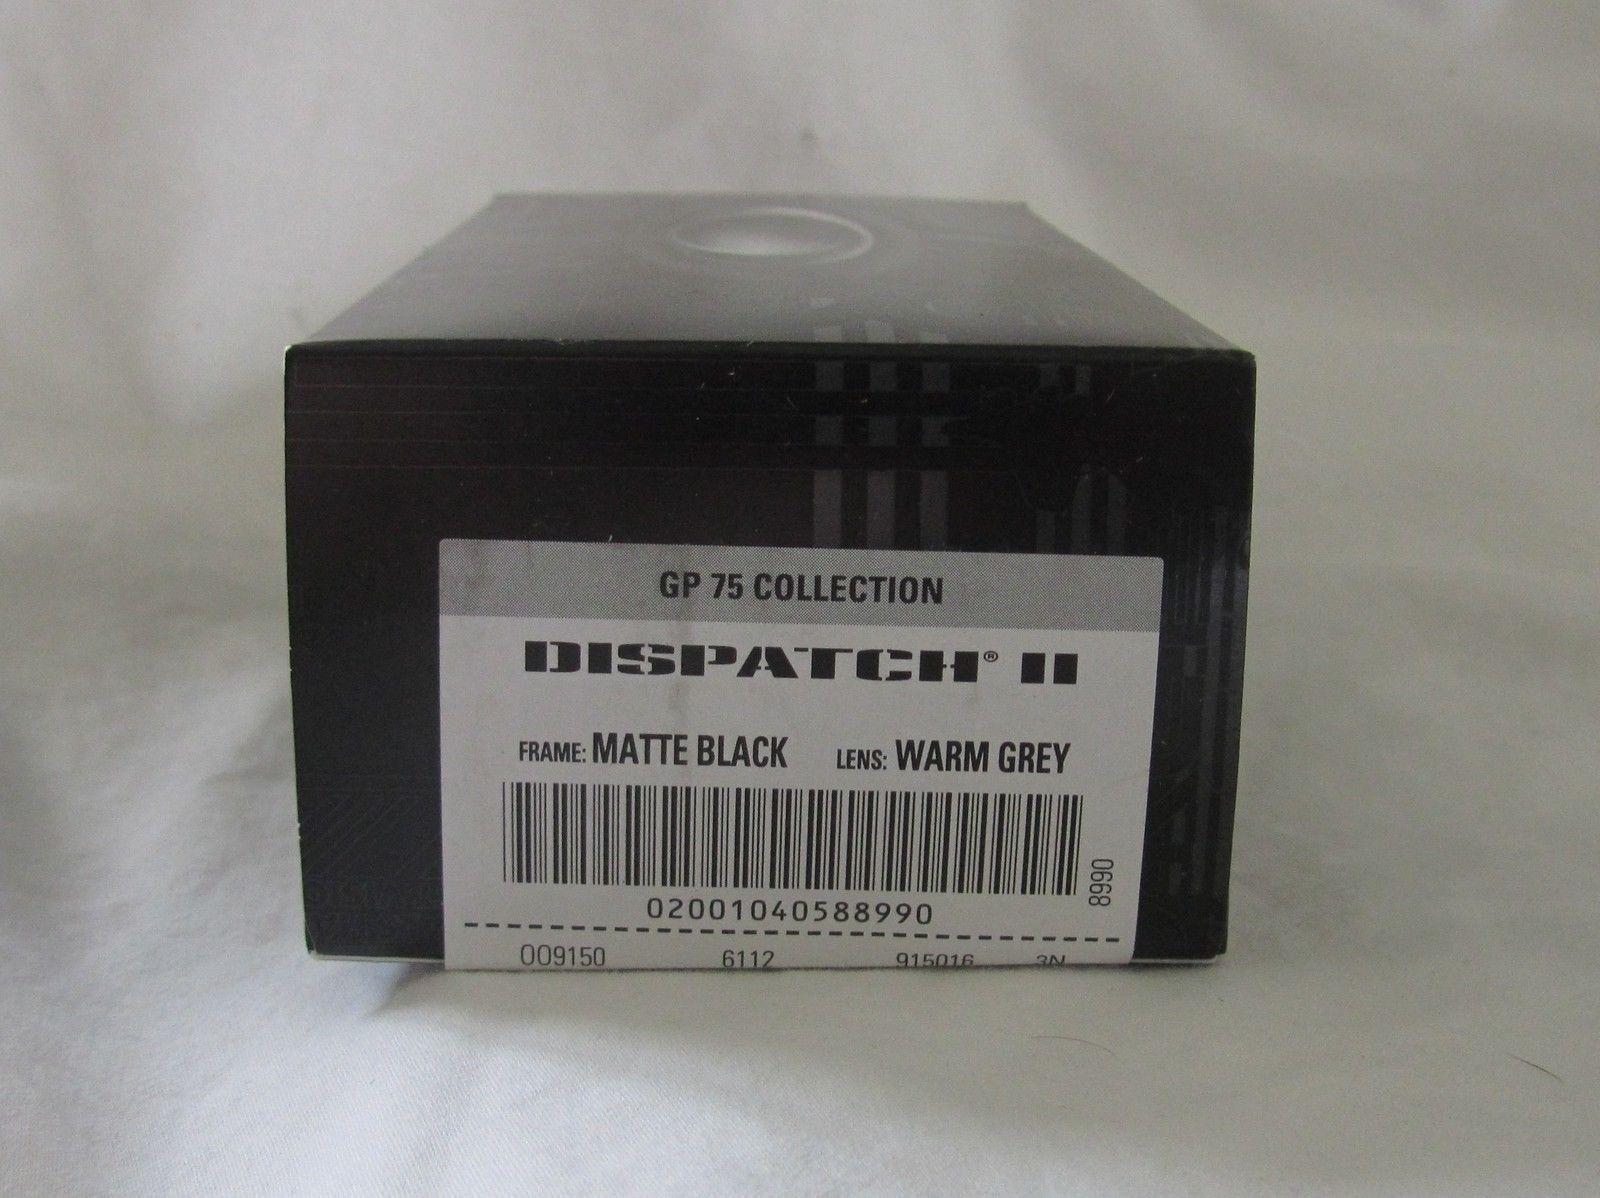 GP 75 Dispatch 2, Black / Warm Grey 10/10 Limited Edition Authentic - dispatch09.jpg